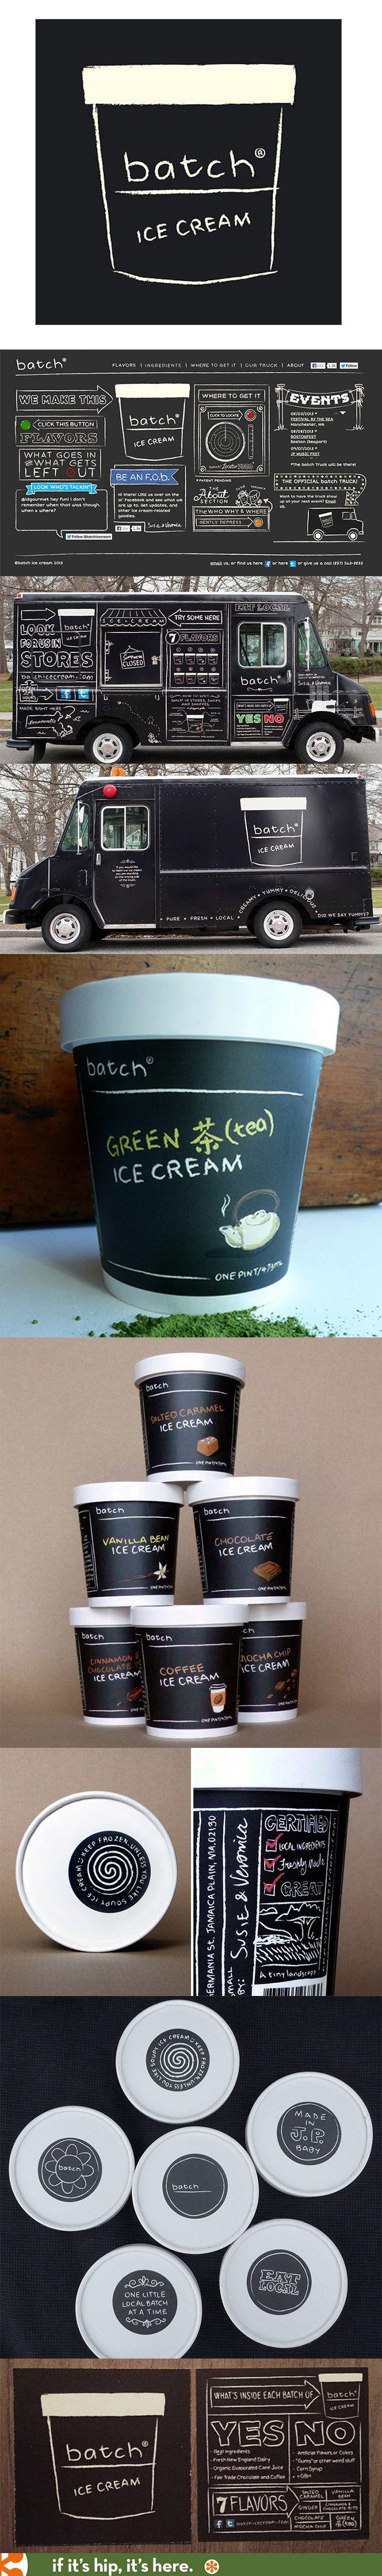 Branding Mobile Truck Packaging And Web Design For Batch Ice Cream Branding Packaging Design Corporate Design